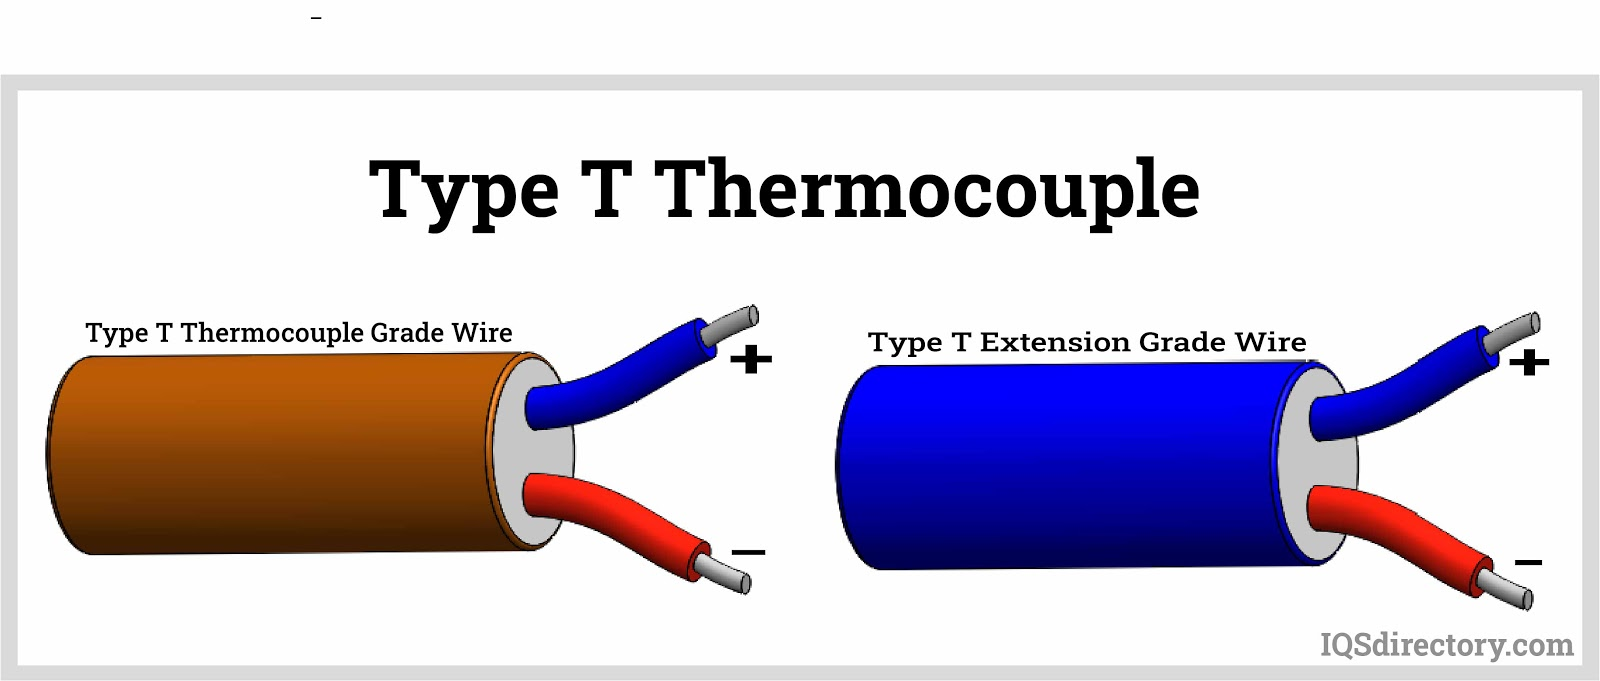 Type T Thermocouple